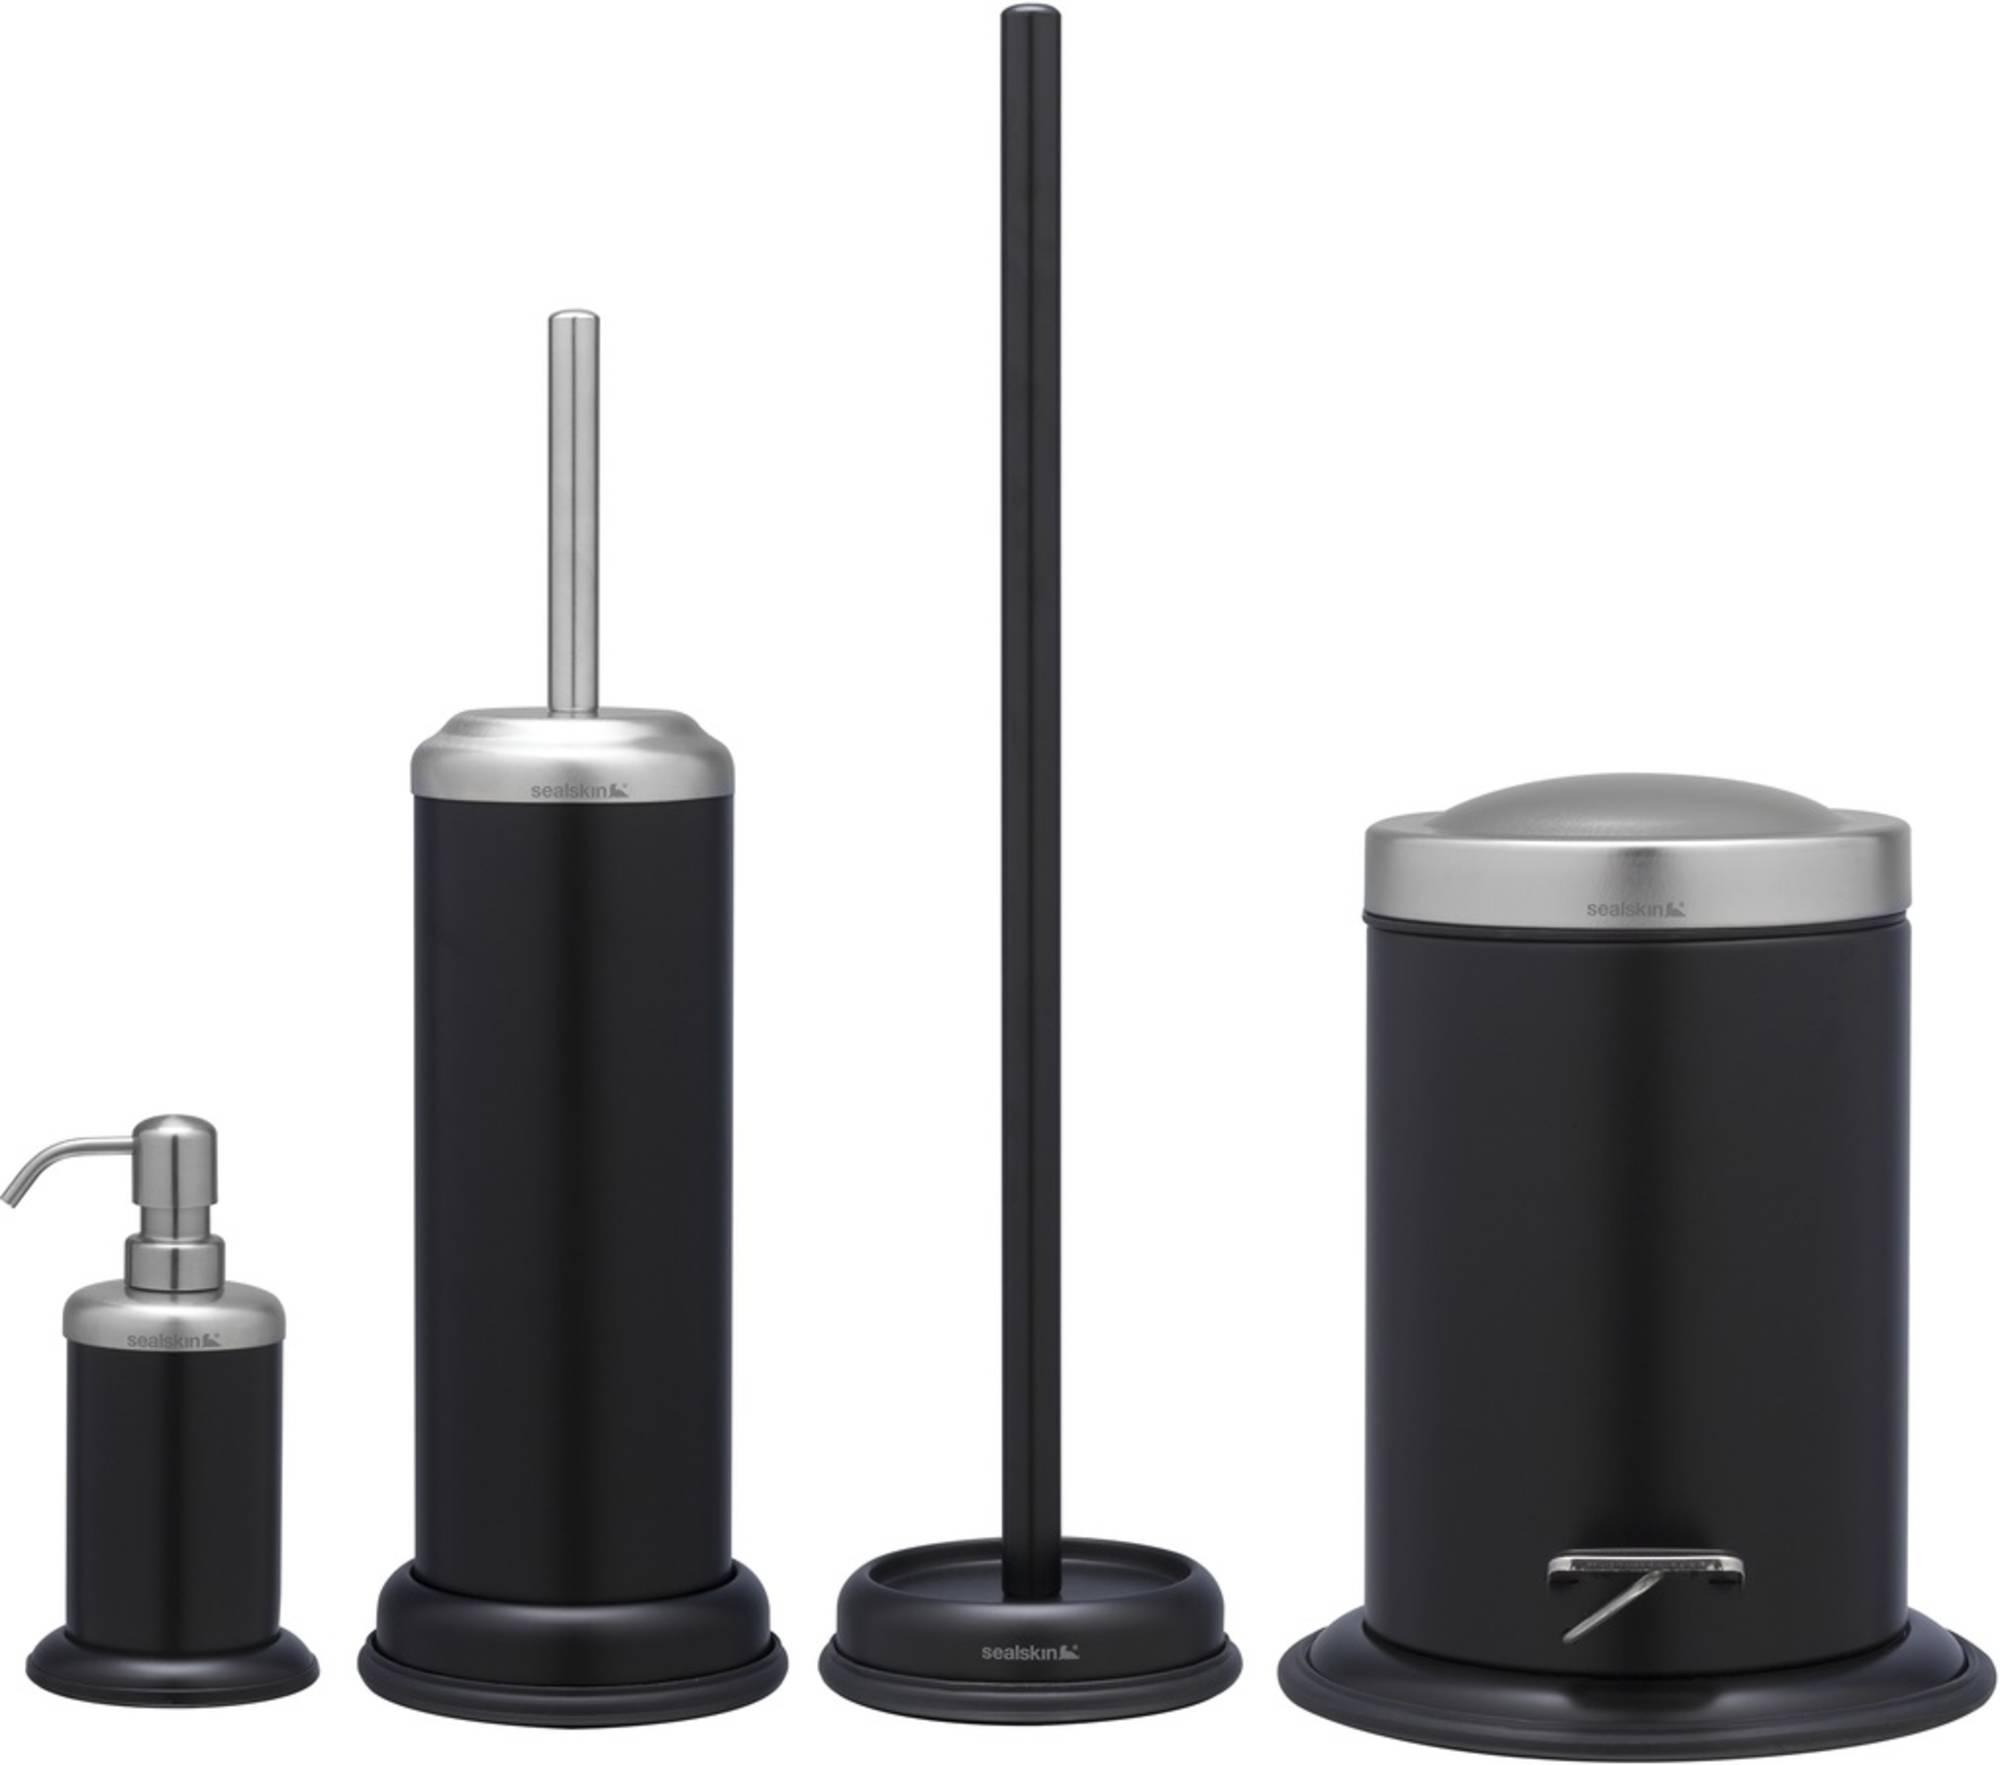 Sealskin Acero accessoireset 4-in-1 zwart